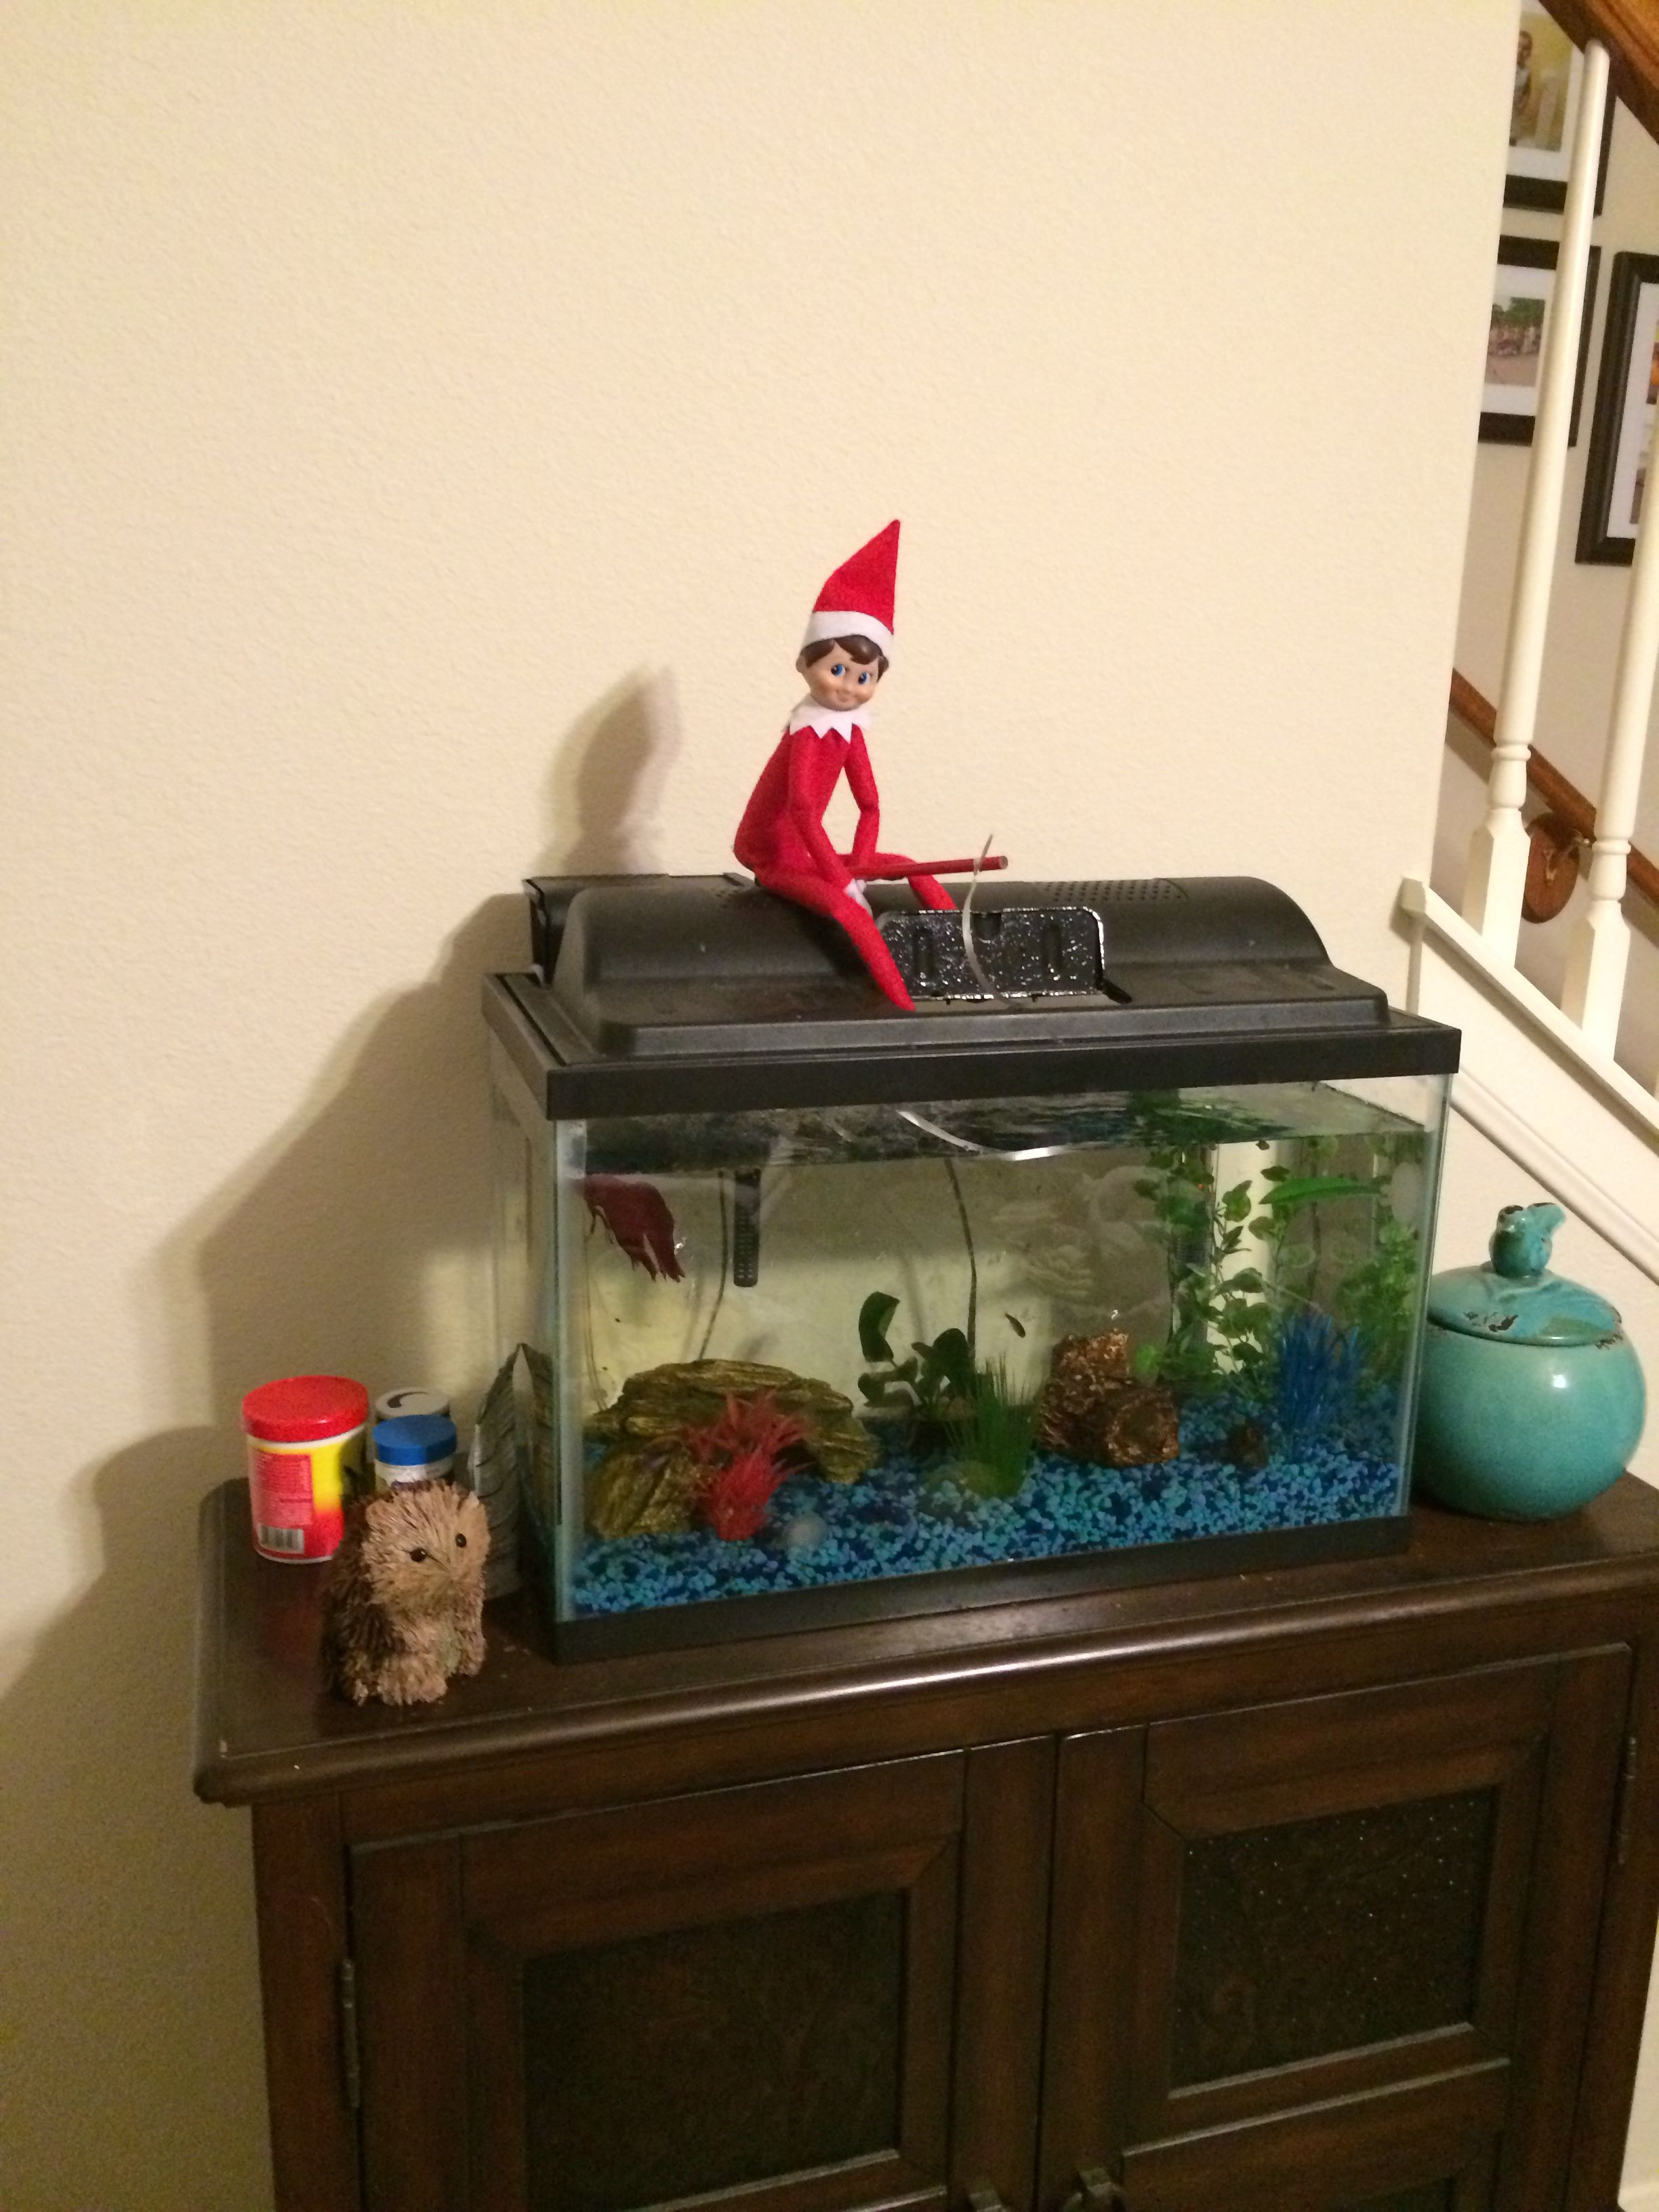 Elf on the Shelf, gone fishing!